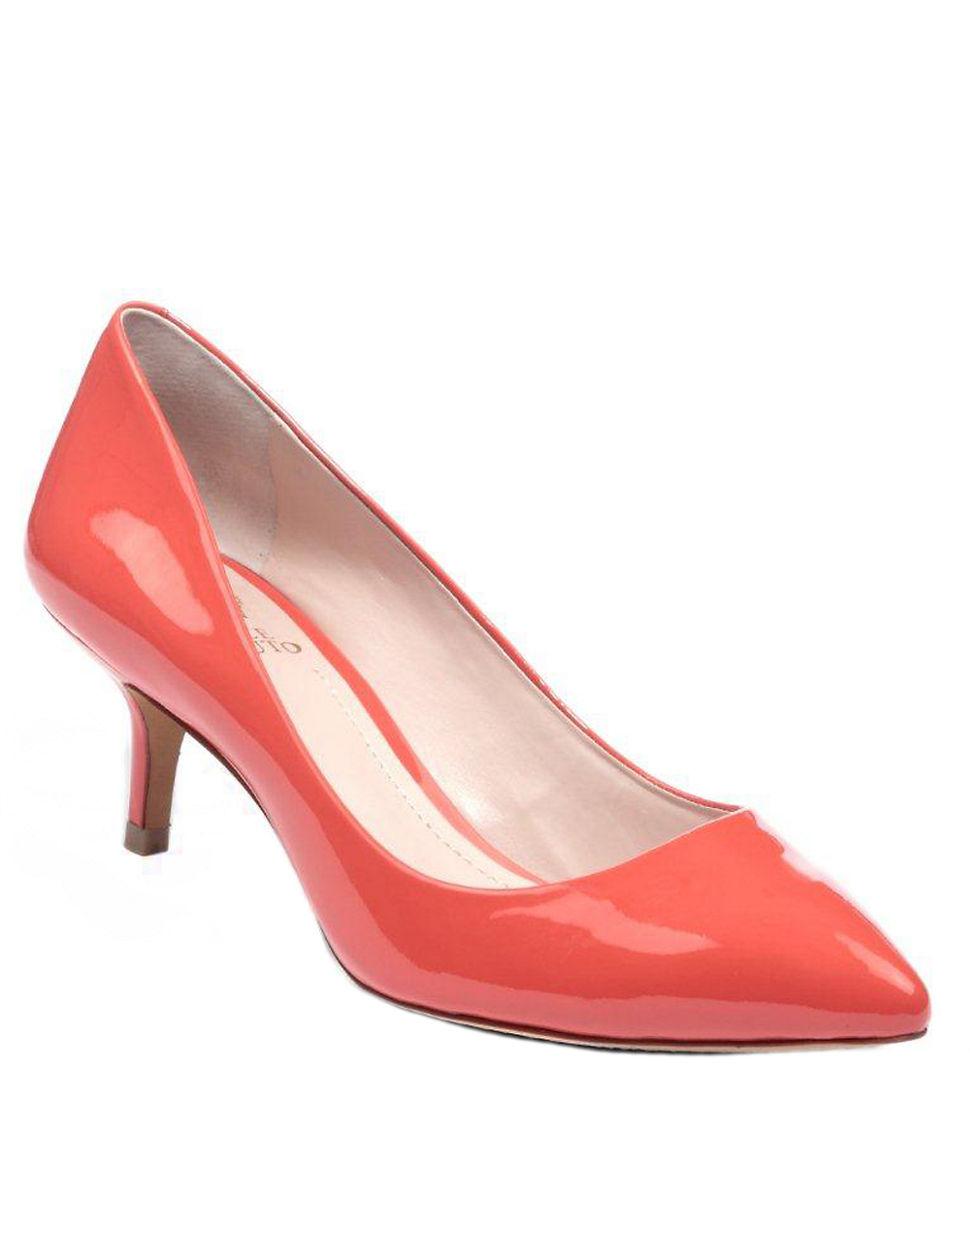 Nordstrom Shoes Red Heels